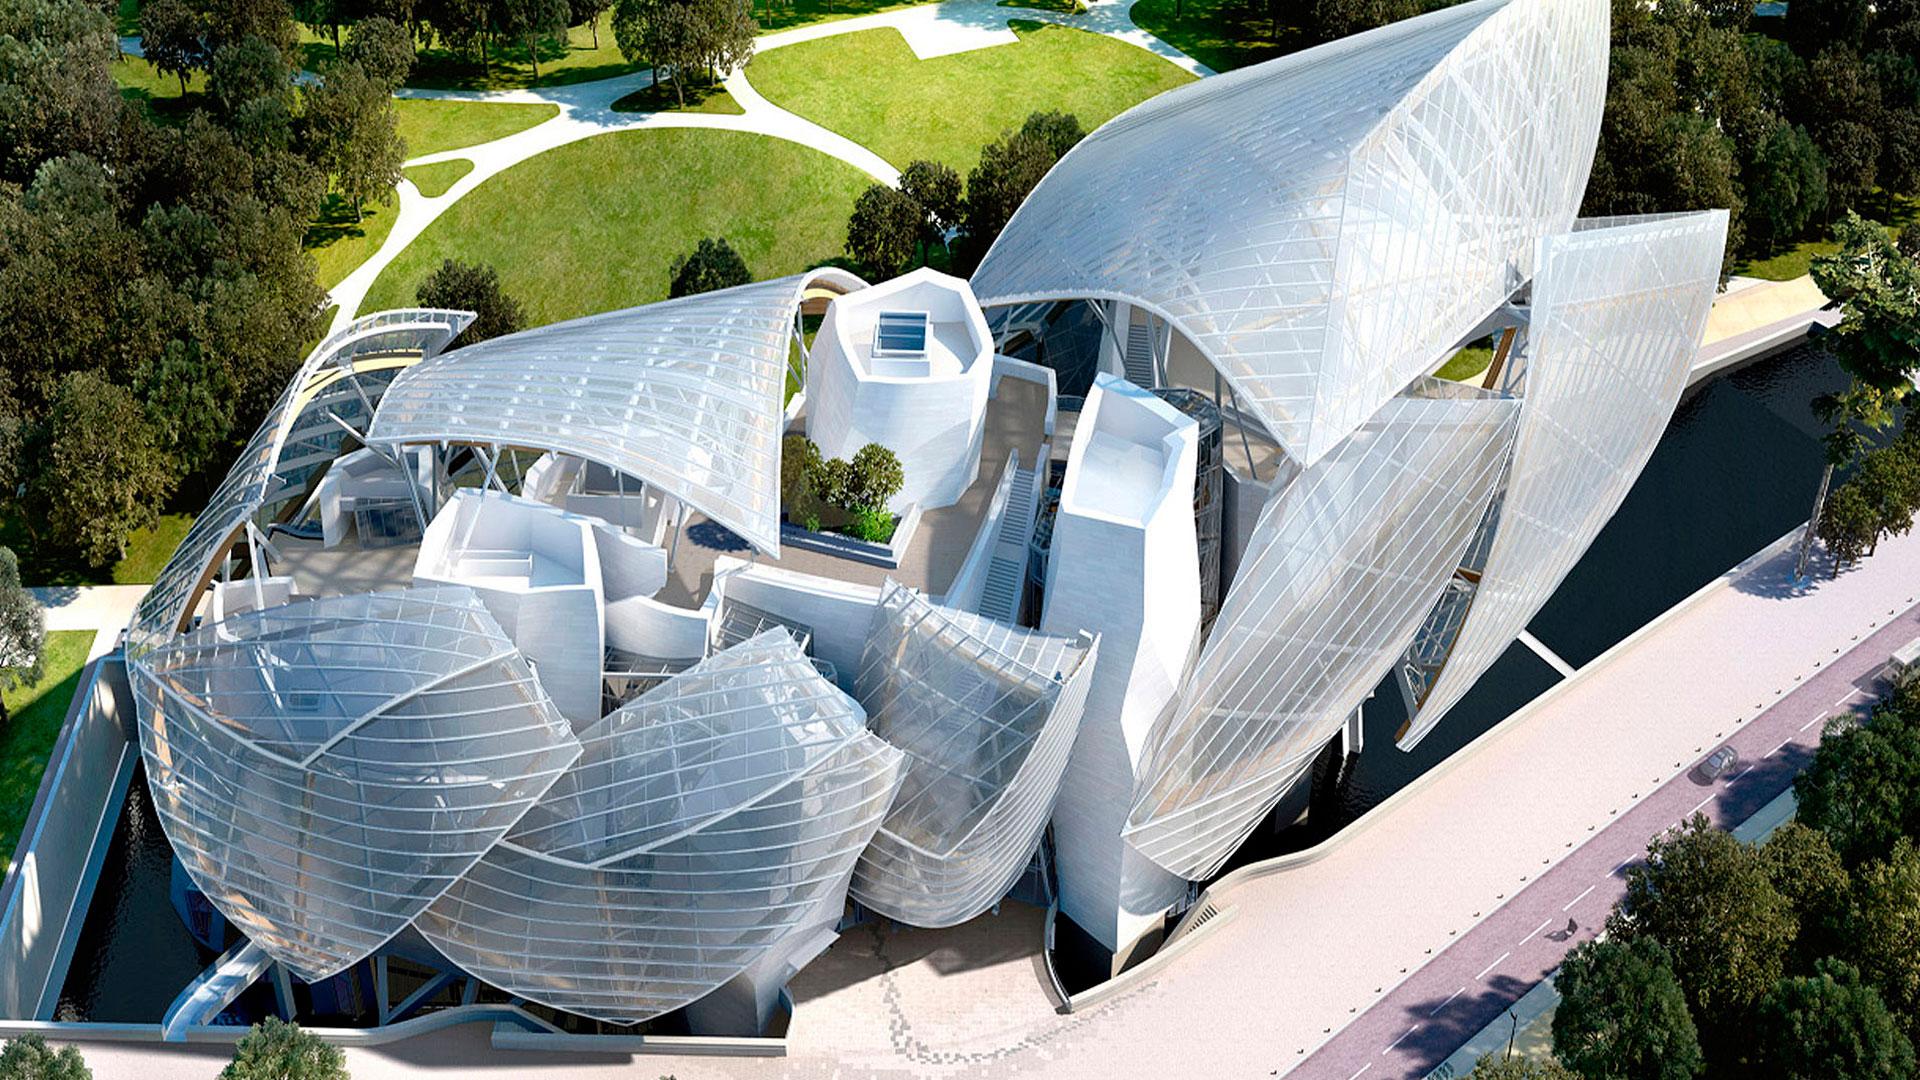 Frank Gehry hero asset